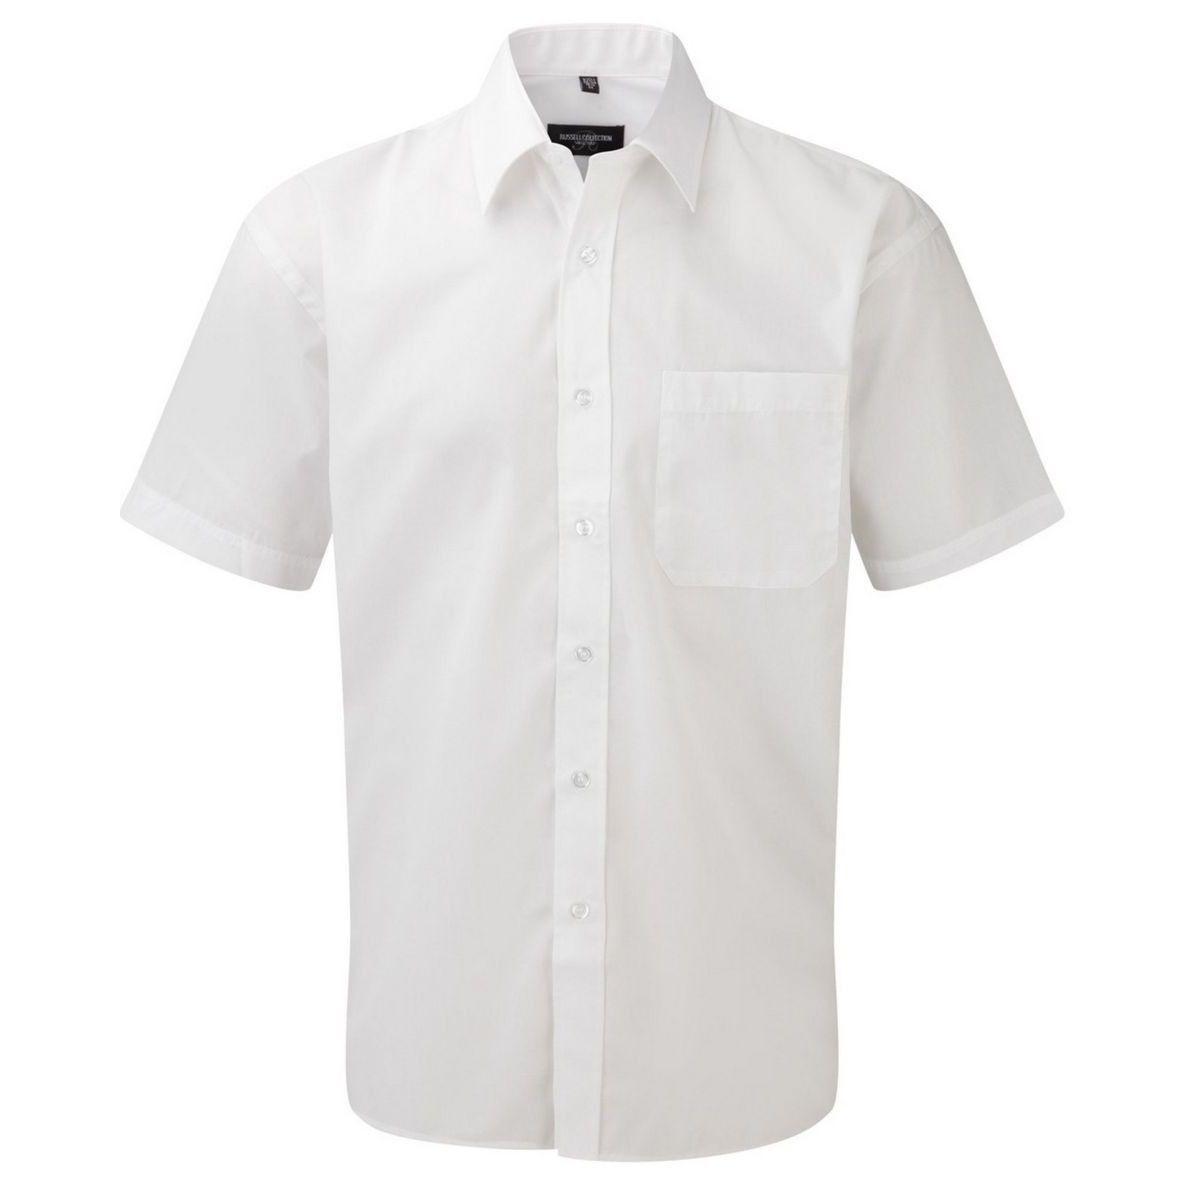 Lot de 2 chemisettes manches courtes poche poitrine